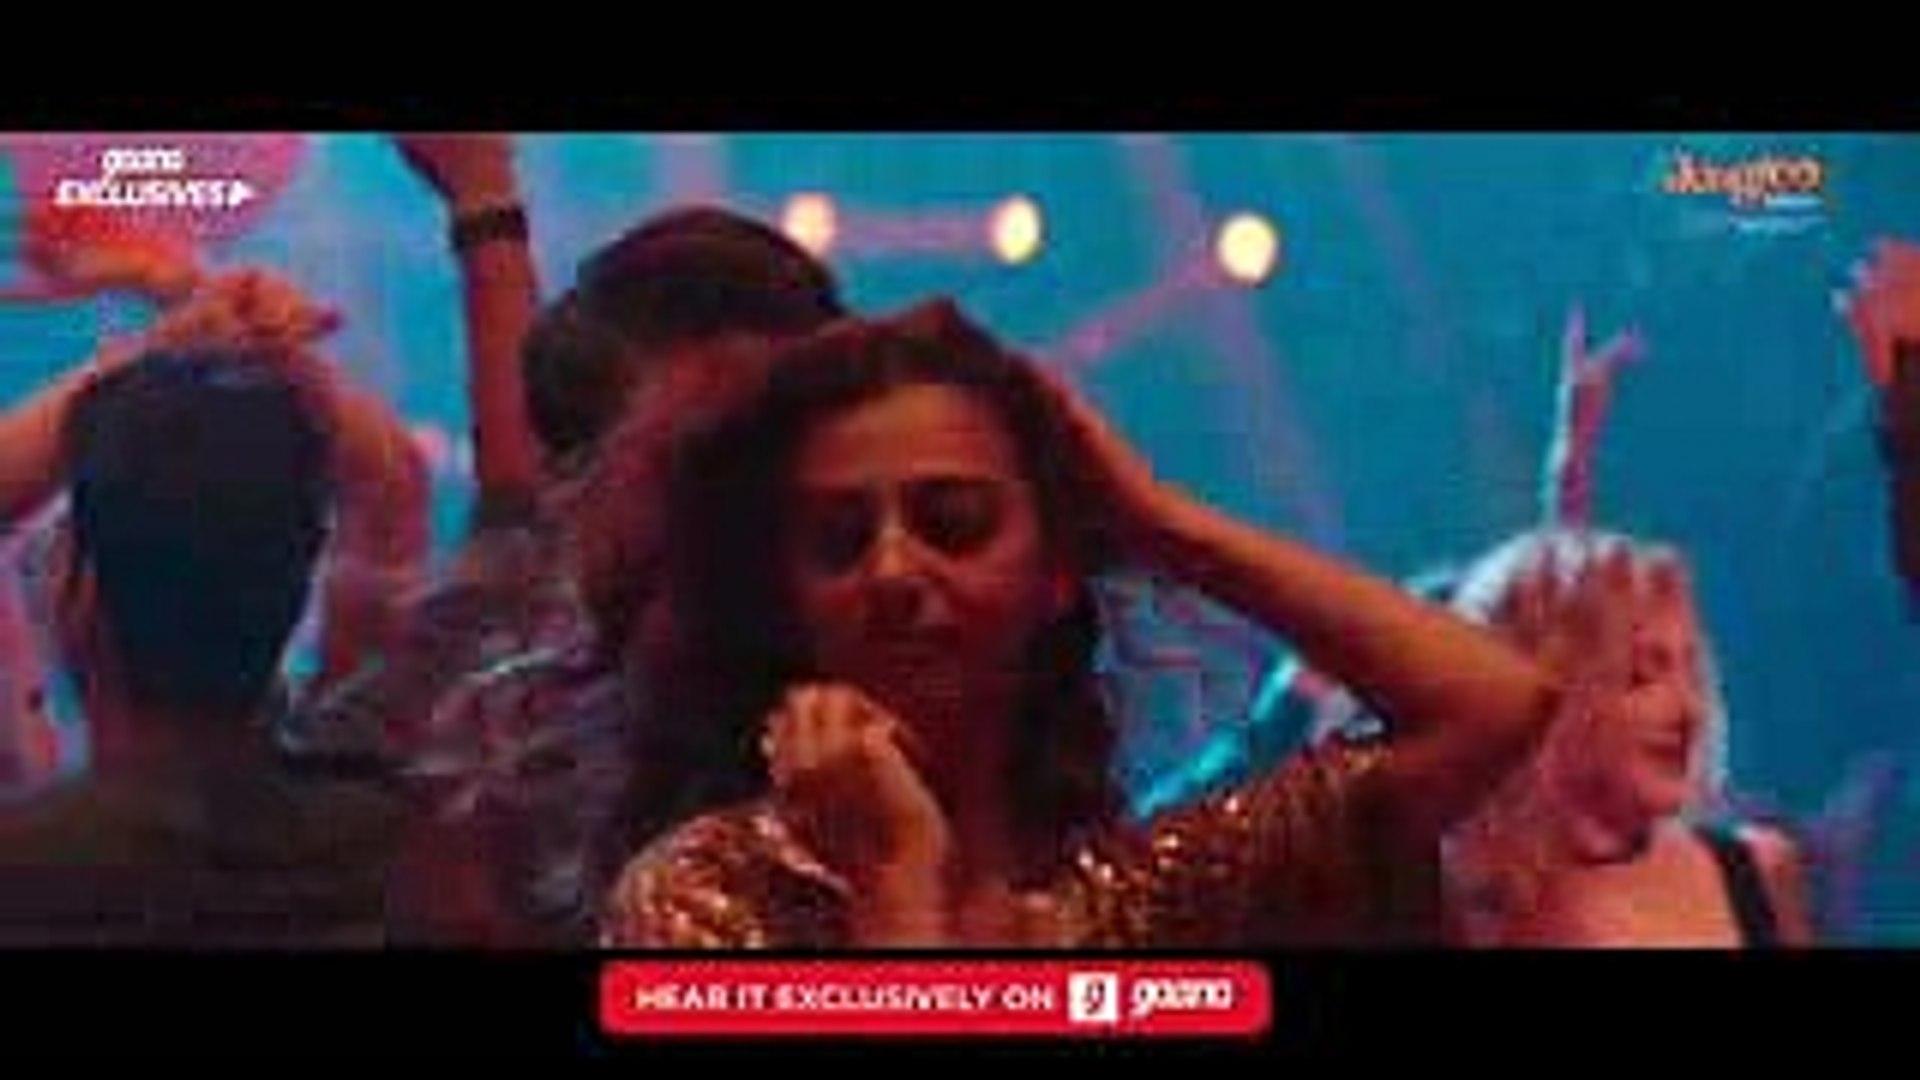 La La La  Neha Kakkar  Bilal Saeed  Baazaar  Saif Ali Khan, Rohan Mehra, Radhika A, Chitrangda S